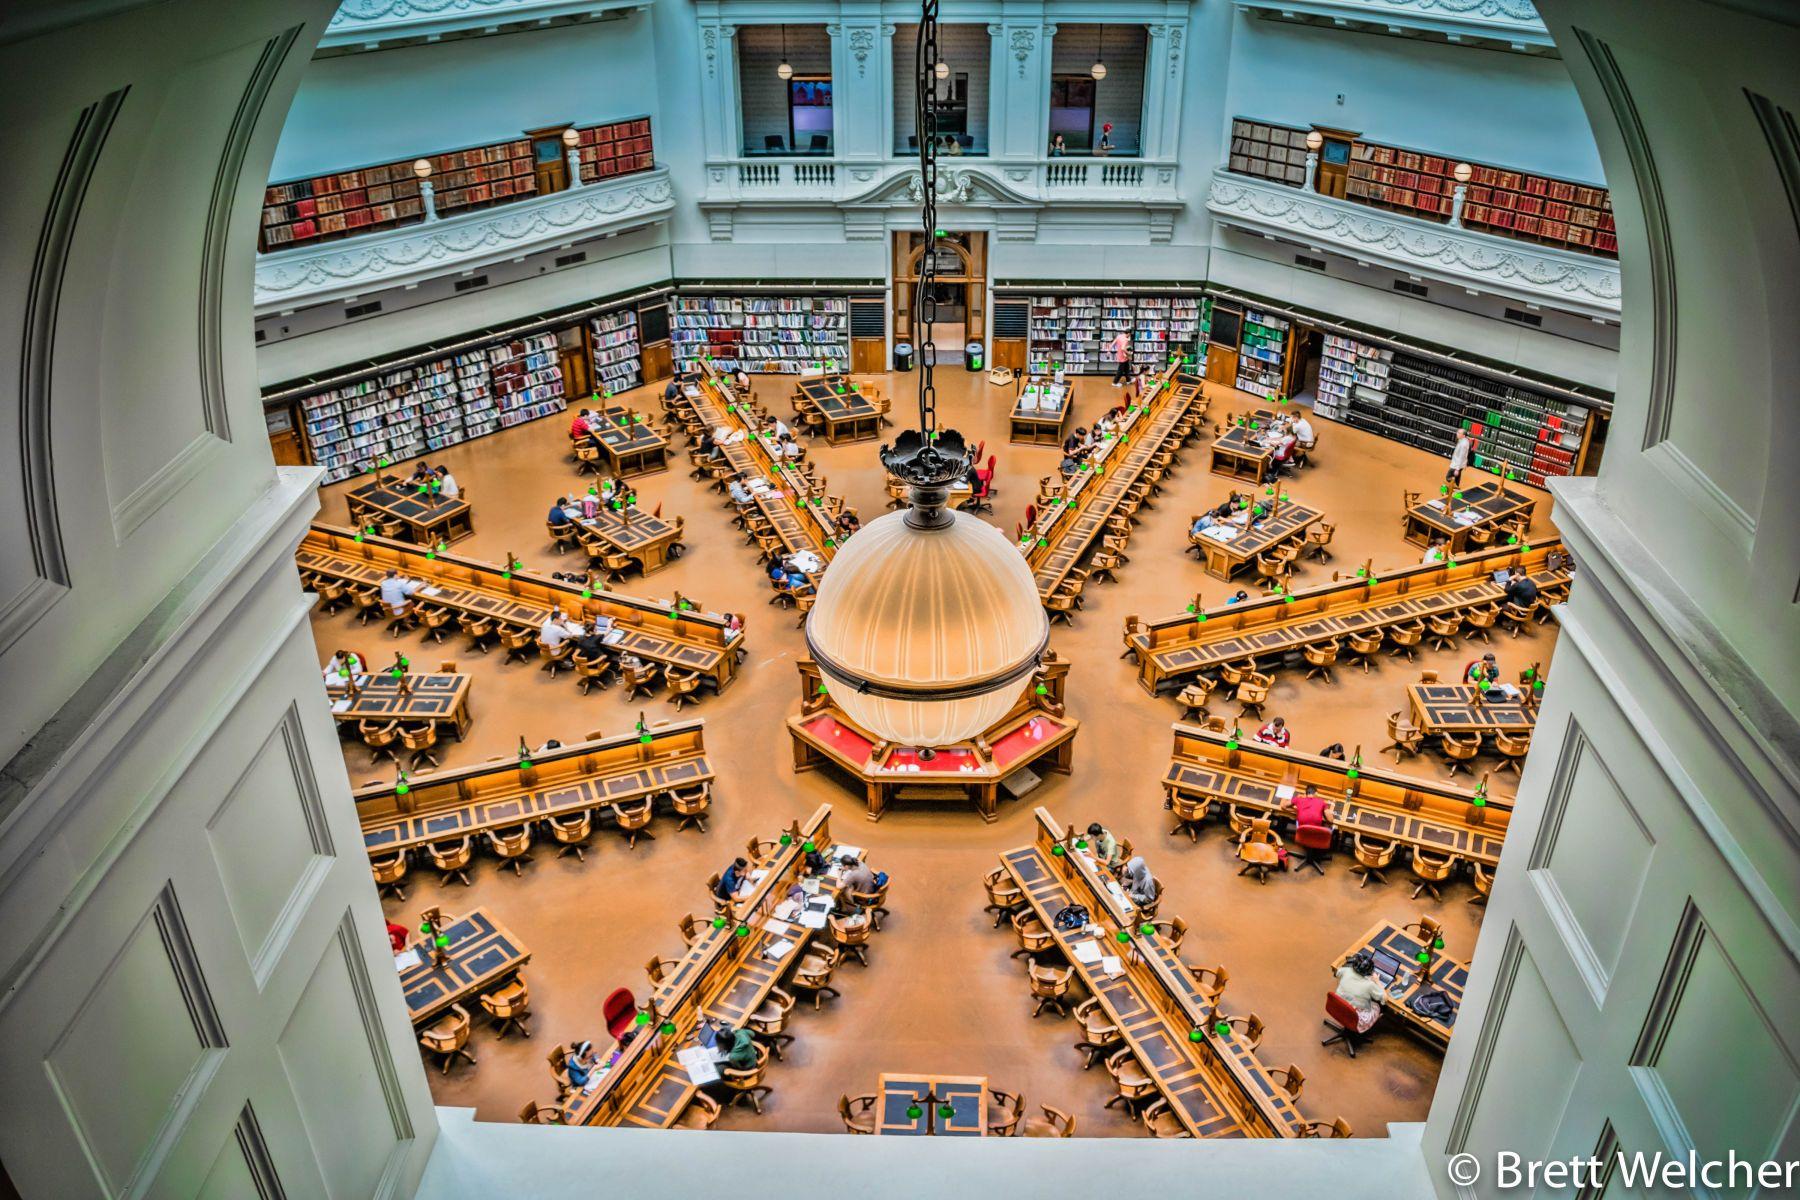 Melbourne Public Library - Melbourne, Victoria